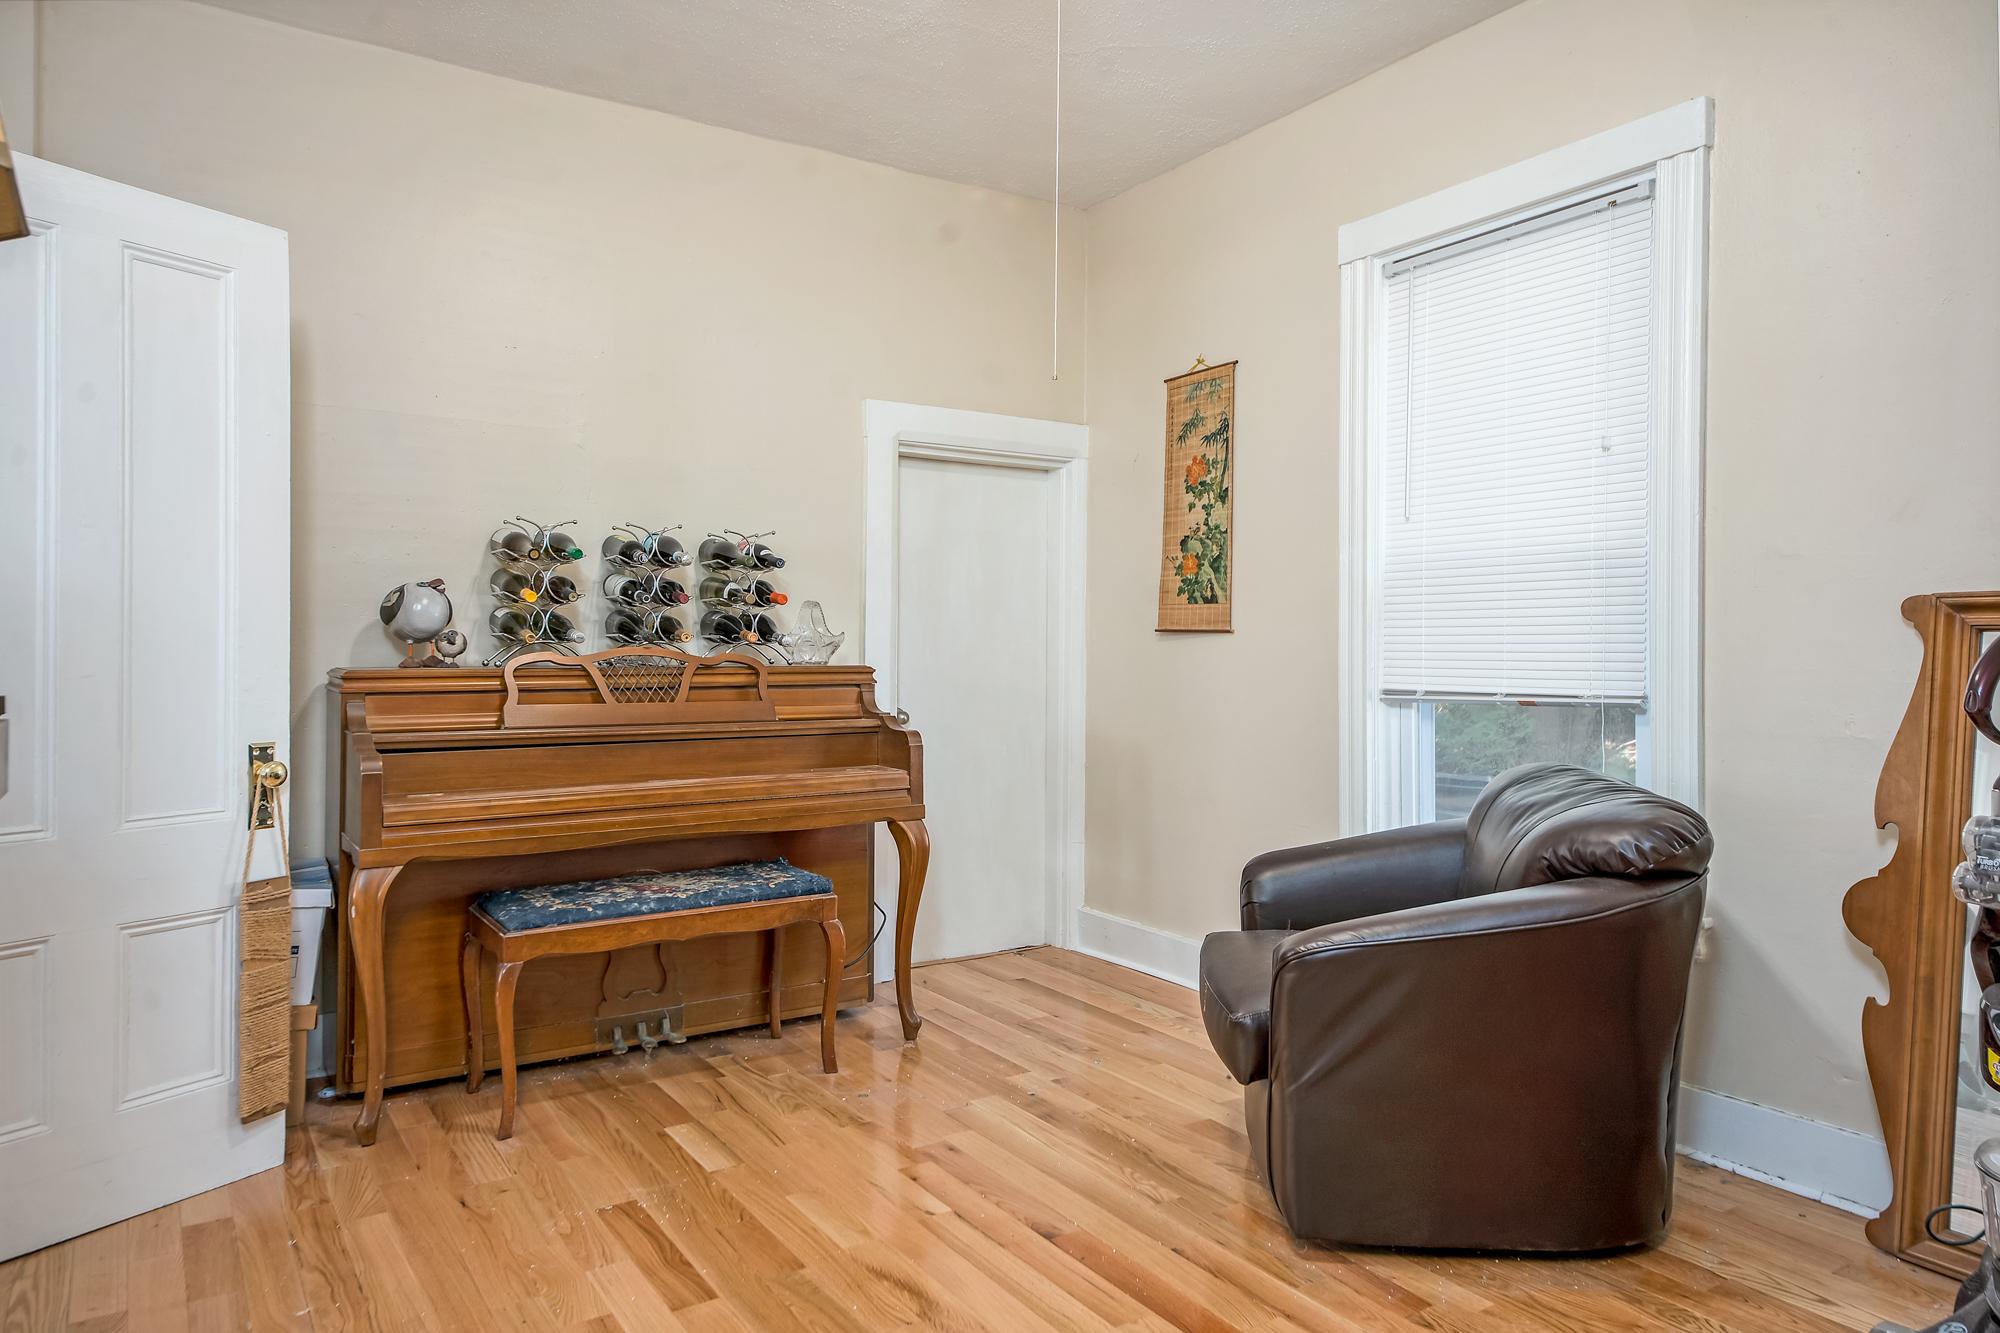 51-53 Prospect-bedroom2 -11.jpg